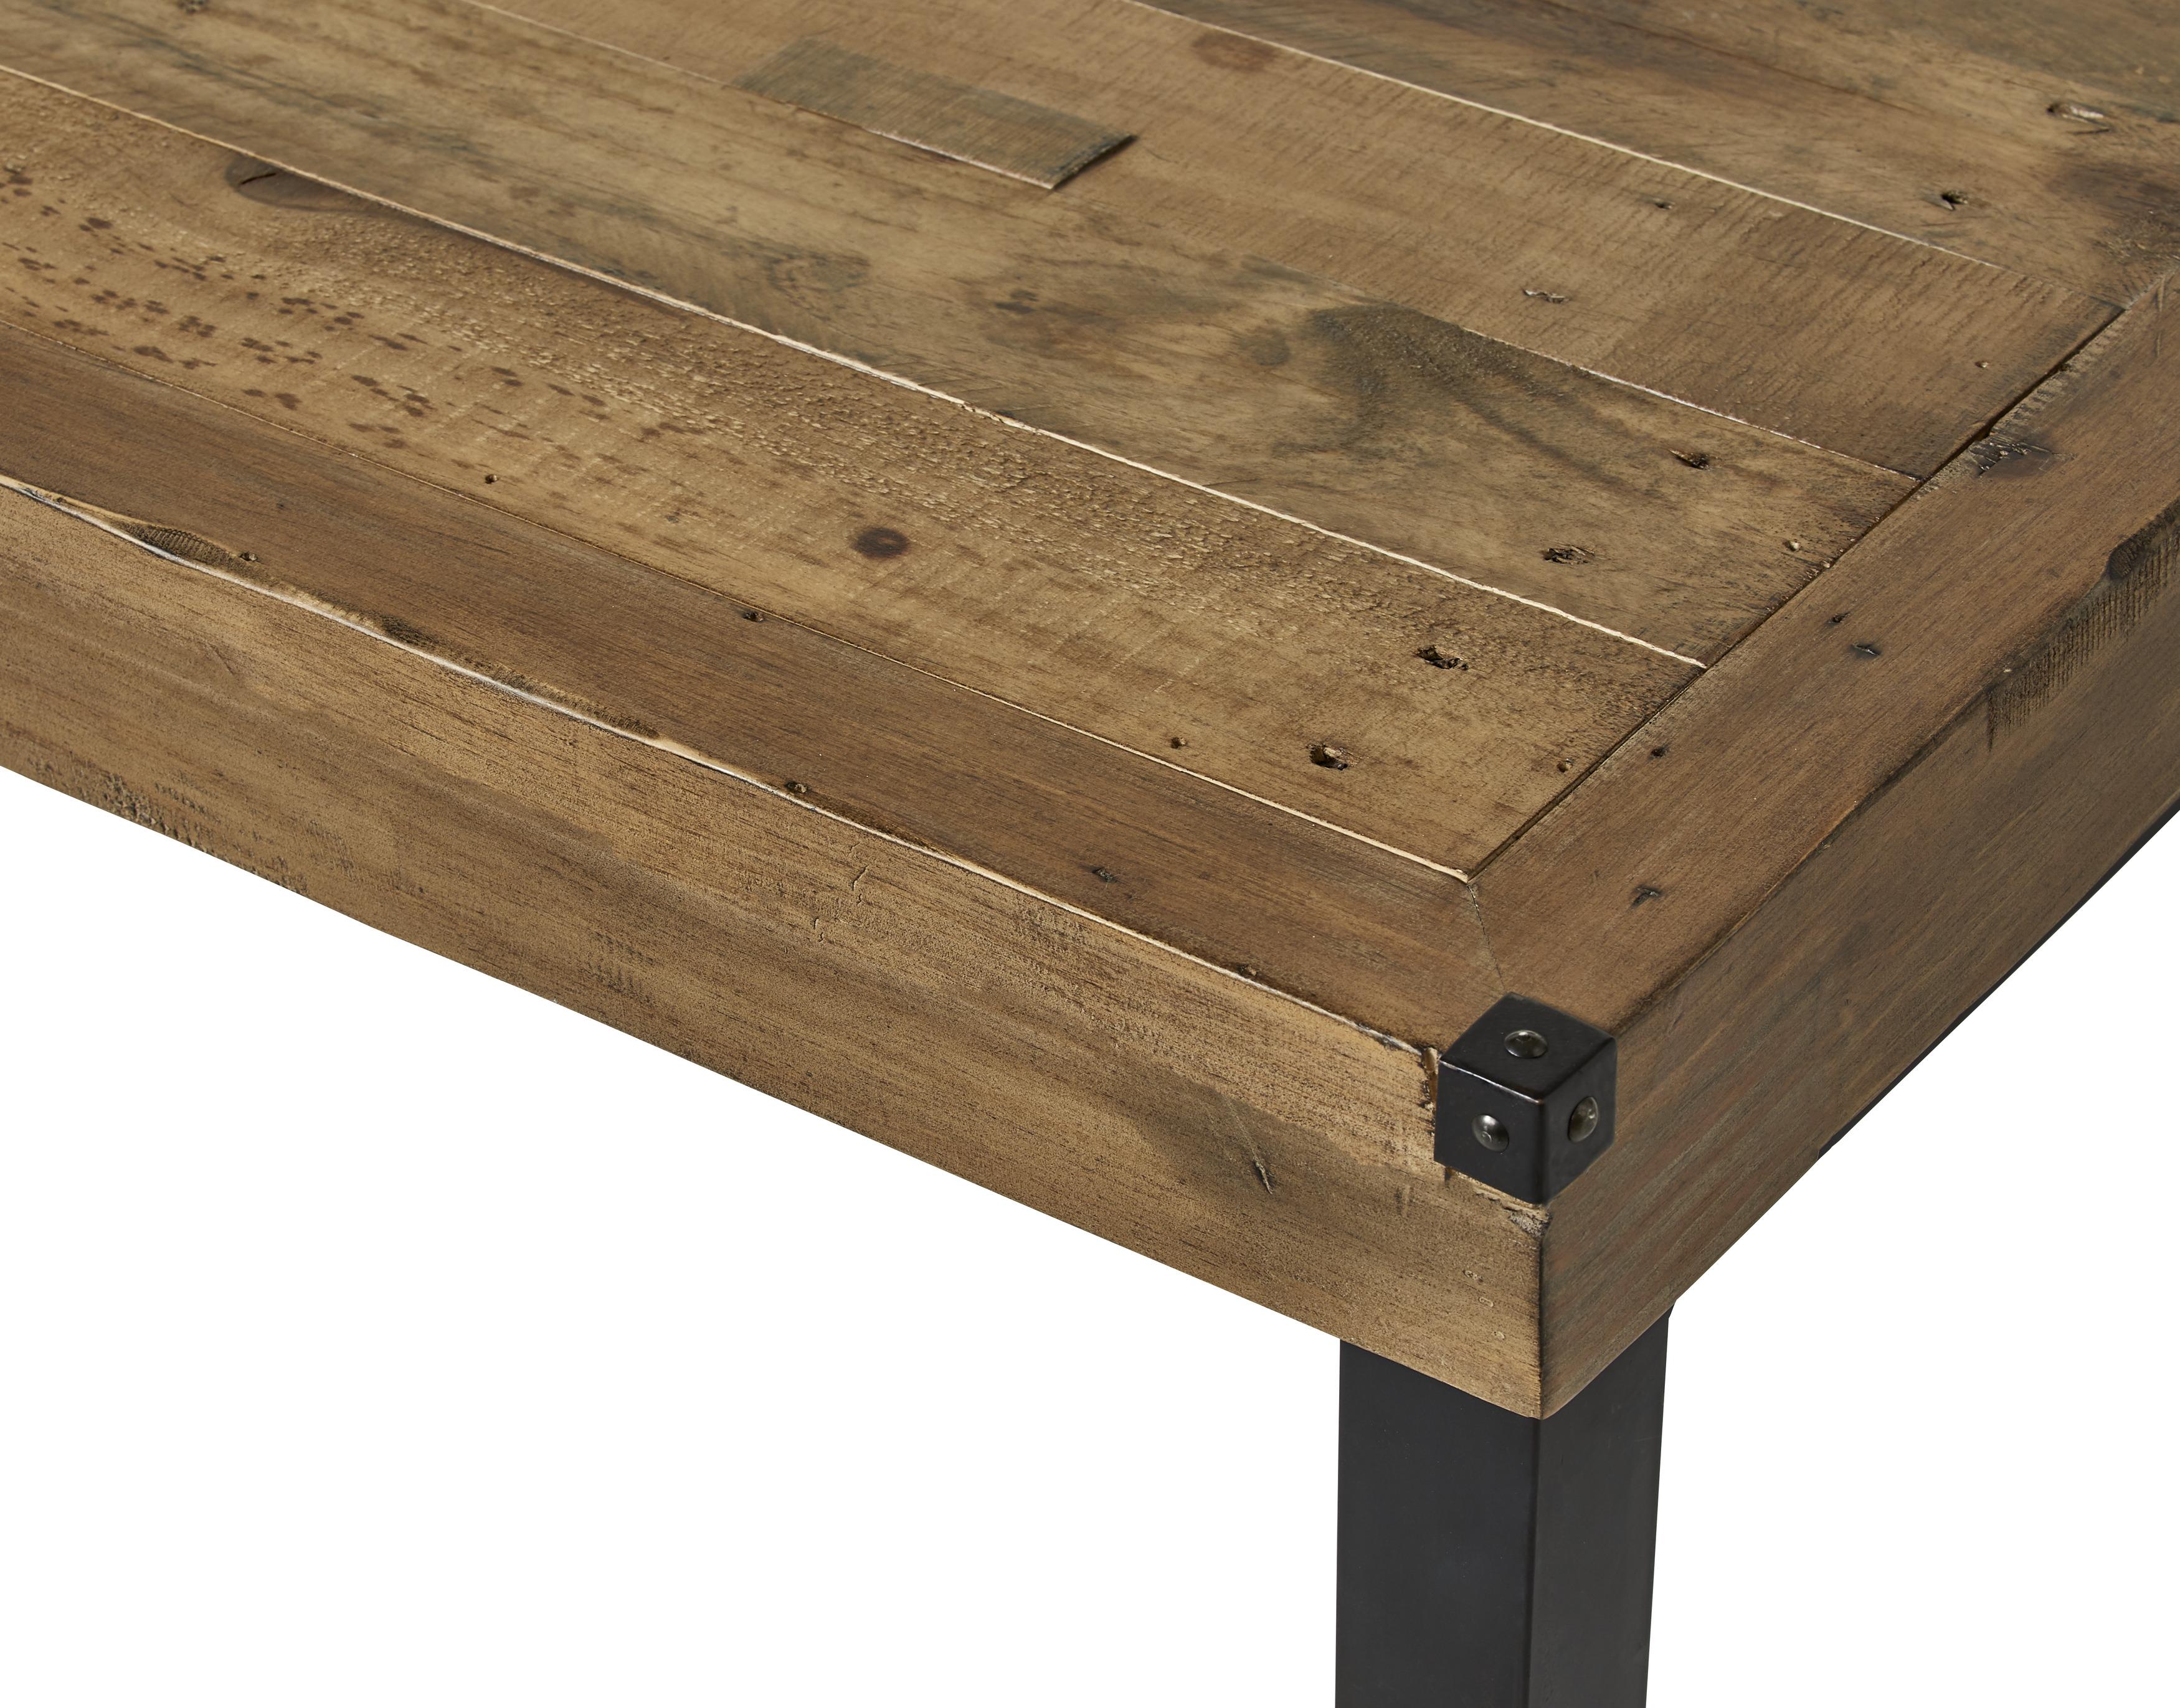 Woodenforge Matbord L 180 240 Cm Mio